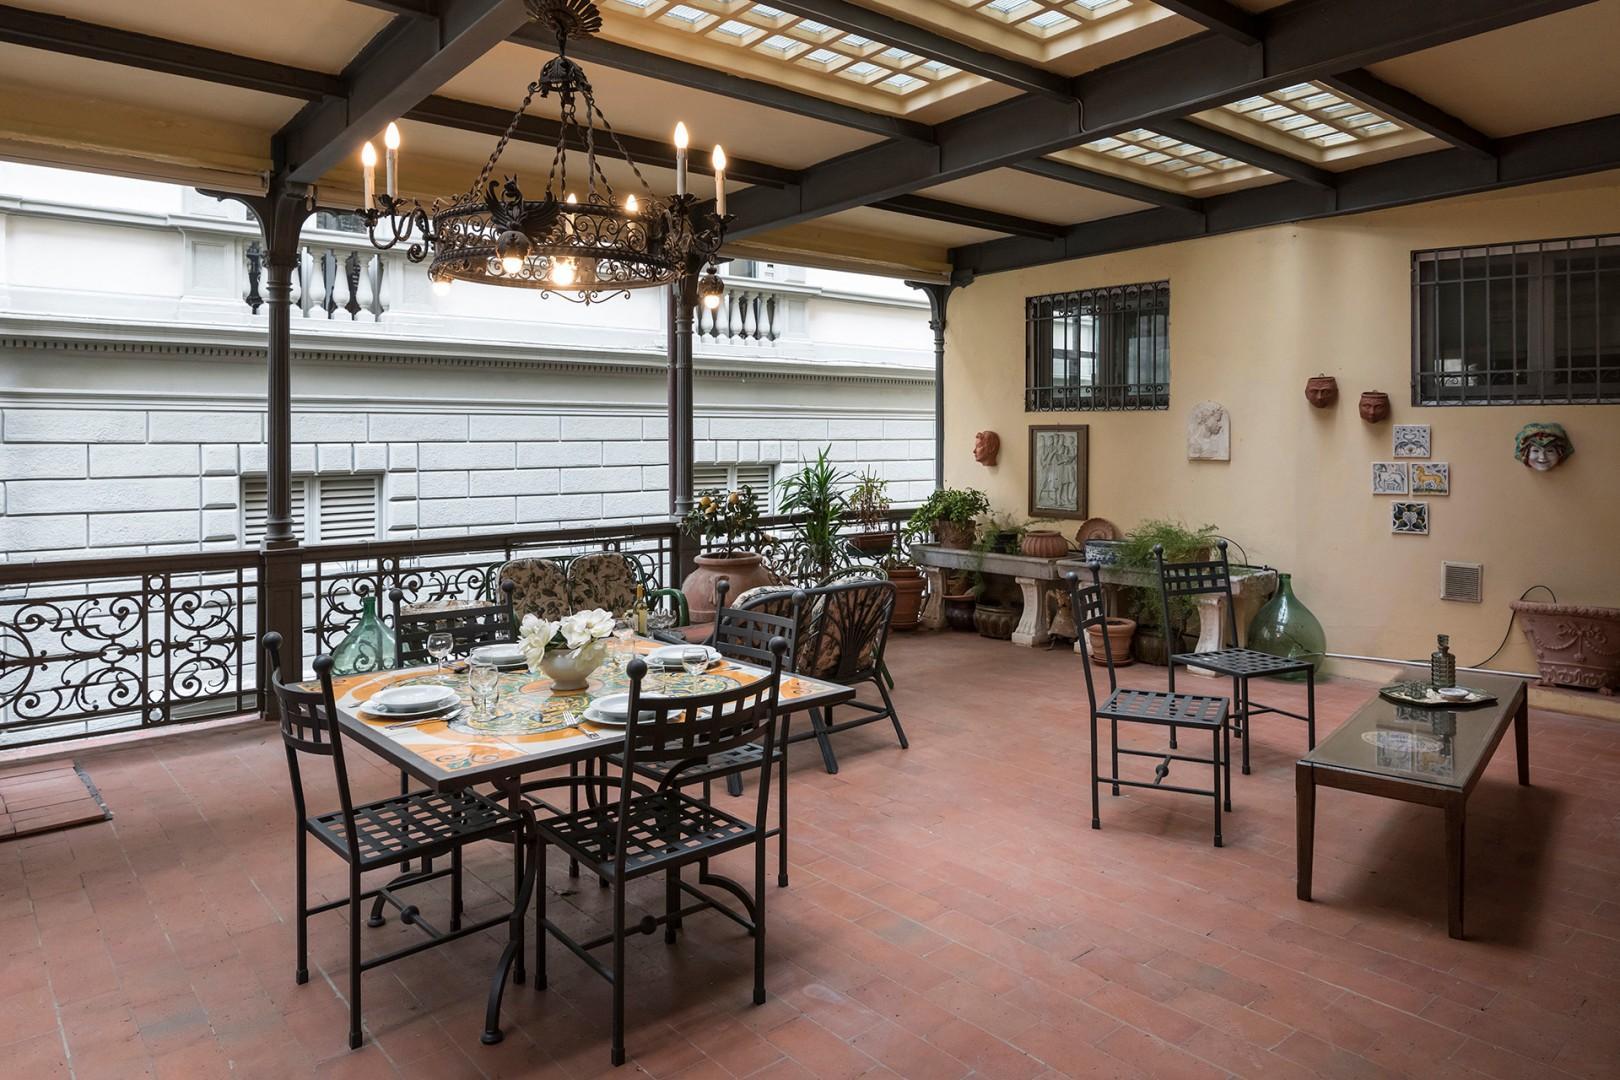 Enjoy meals al fresco on the large shady terrace.